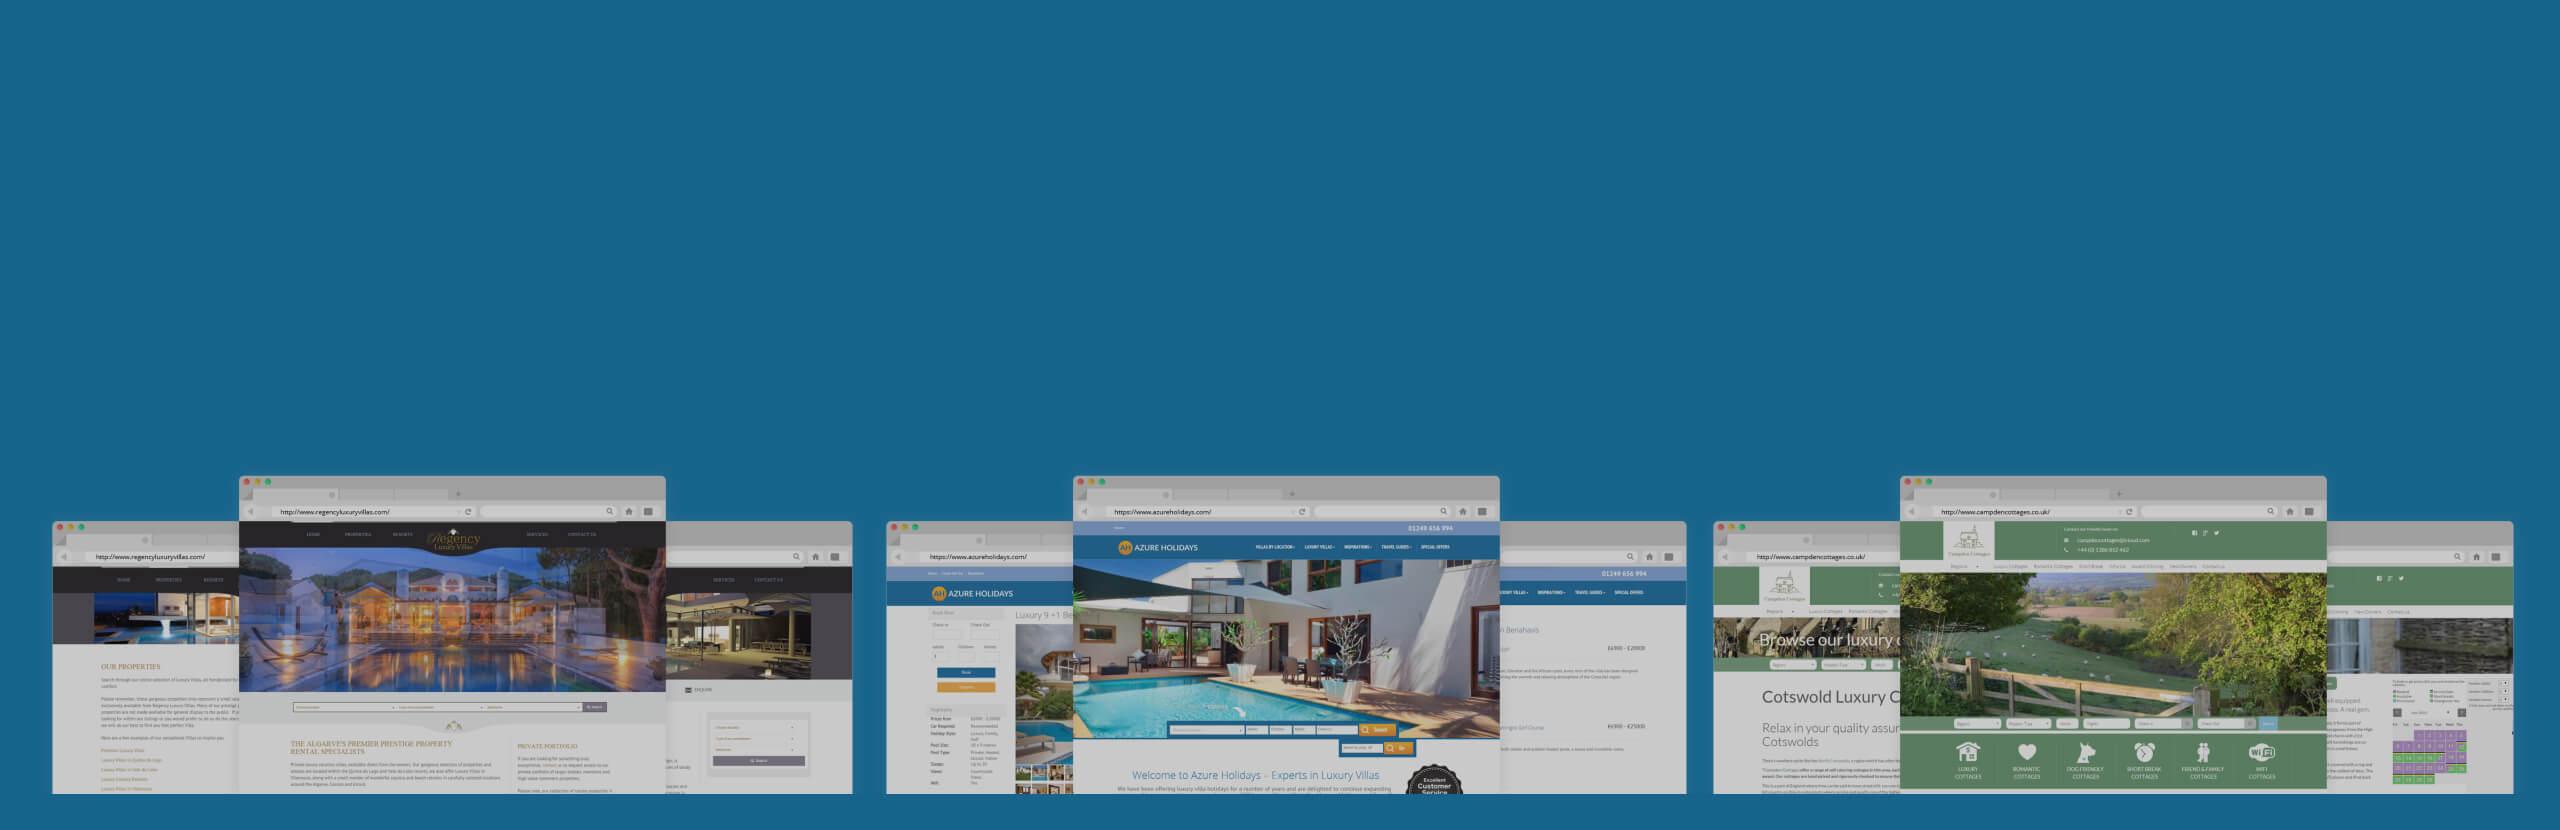 Web design image 2